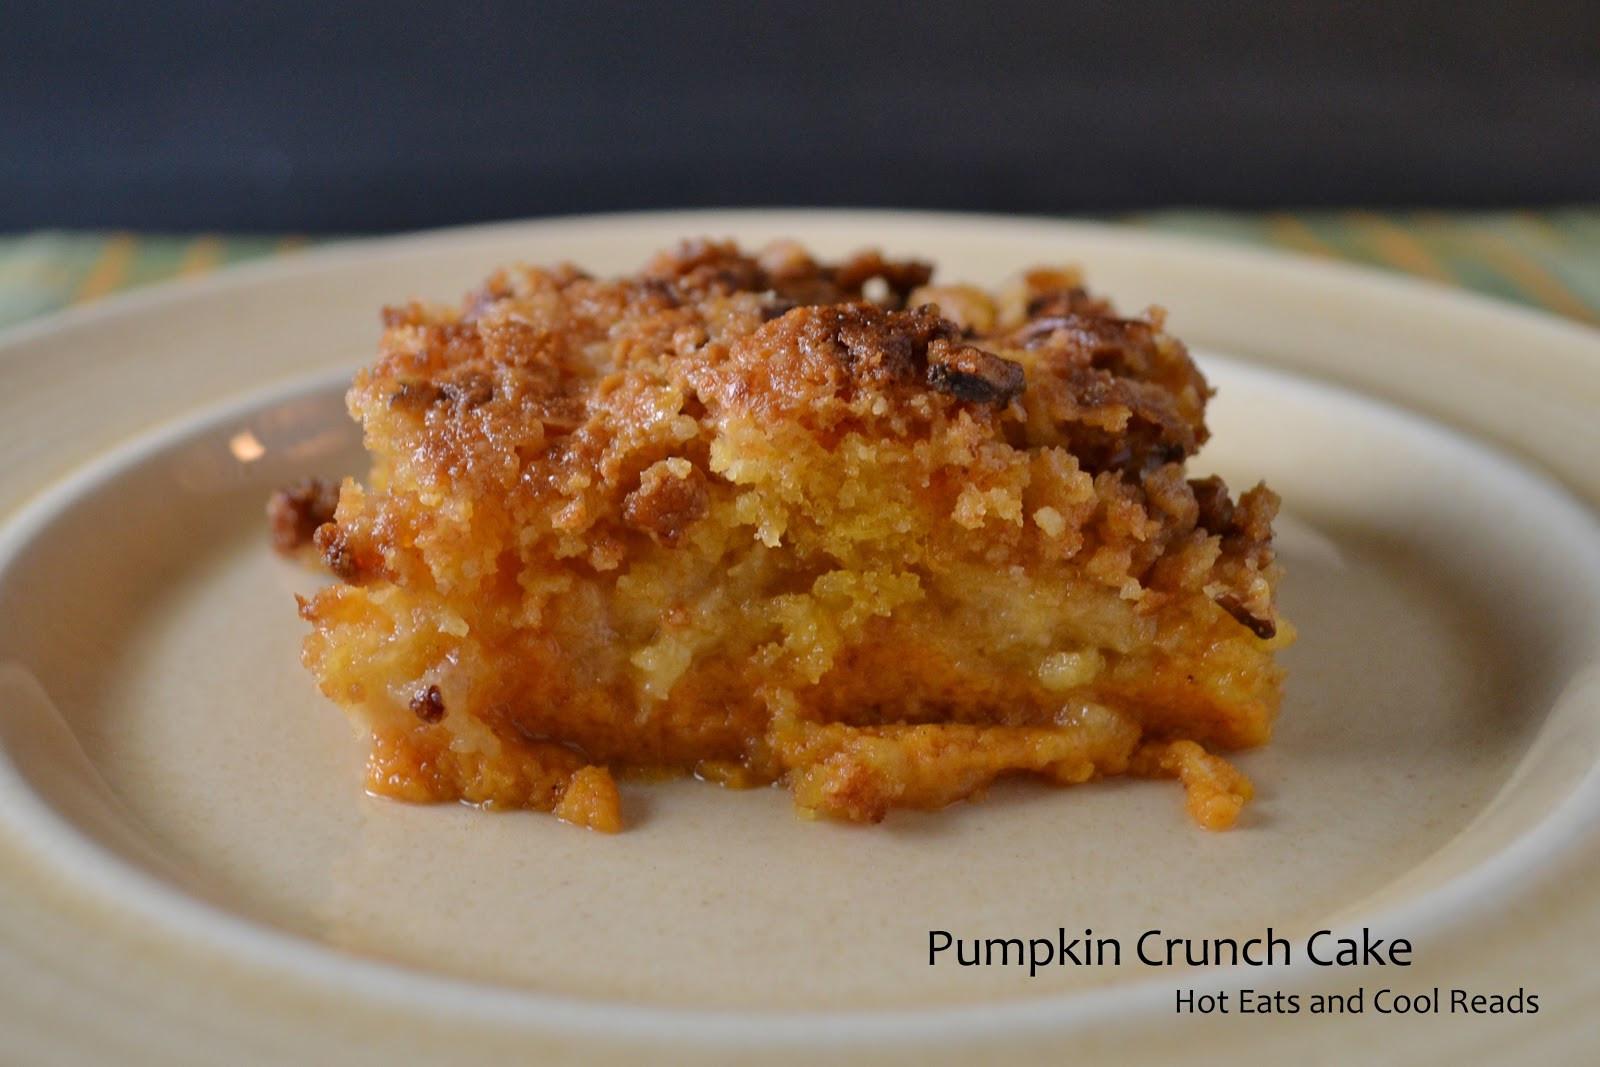 Pumpkin Crunch Cake Recipe  Hot Eats and Cool Reads Pumpkin Crunch Cake Recipe